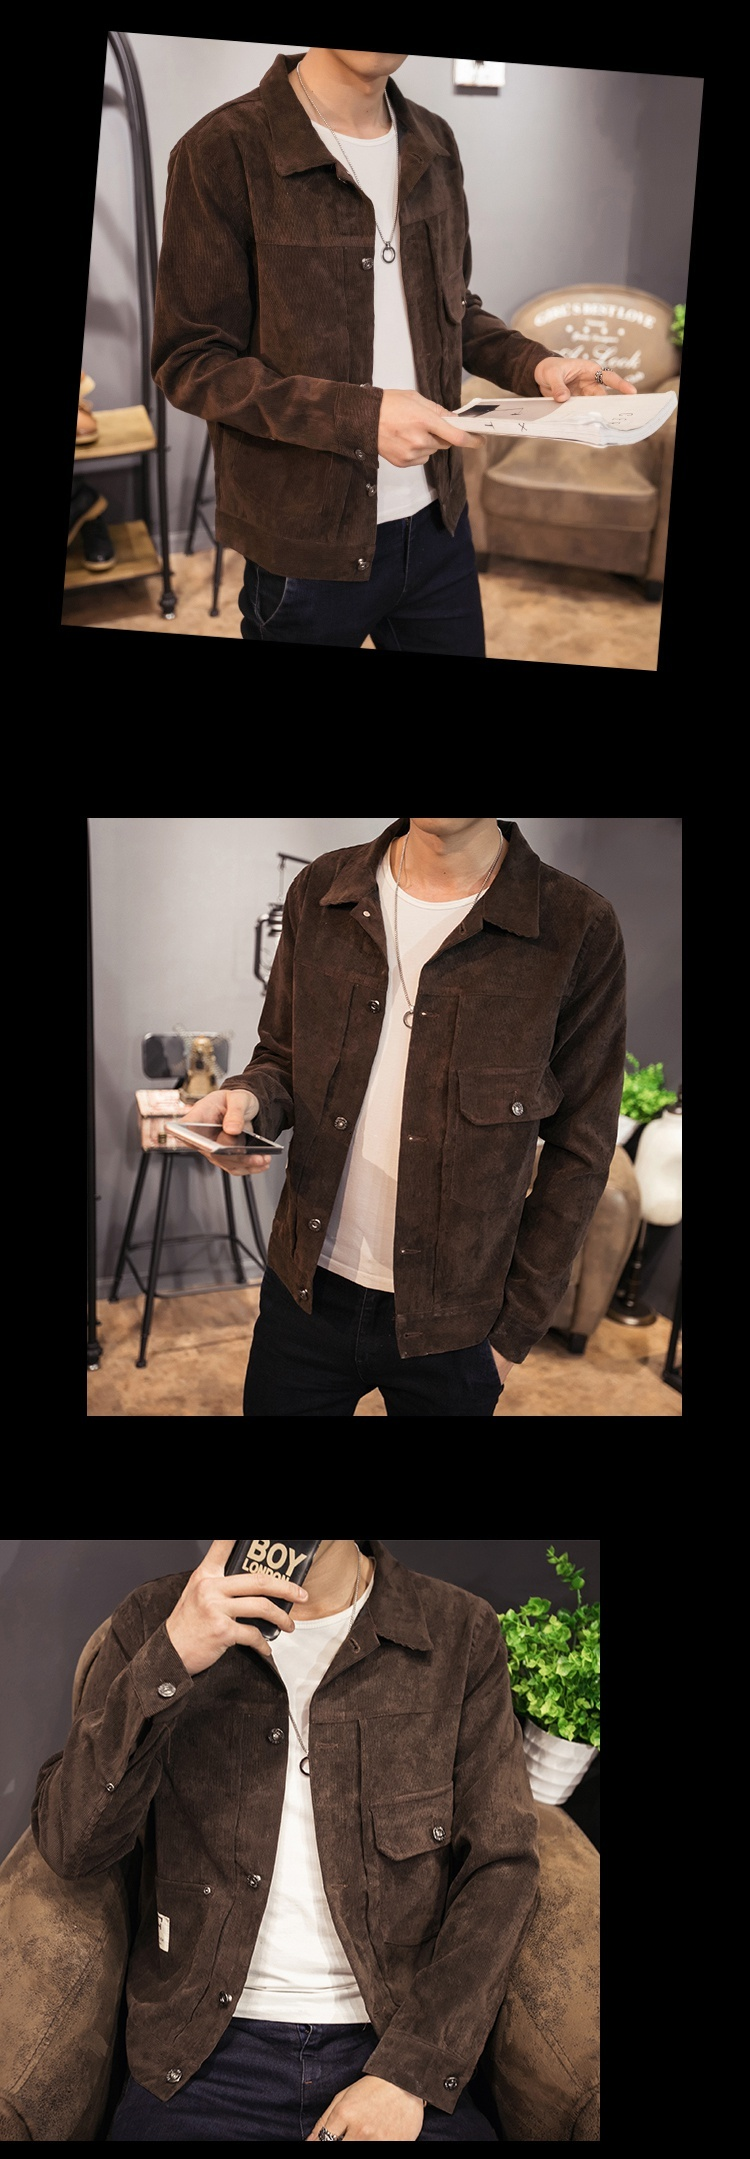 H7d6f8f8cad9f45e59d1b50c64b6d93a6E Zongke Japan Style Corduroy Jacket Men Hip Hop Streetwear Men Jacket Coat Windbreaker Clothes Bomber Jacket Men 5XL 2019 New